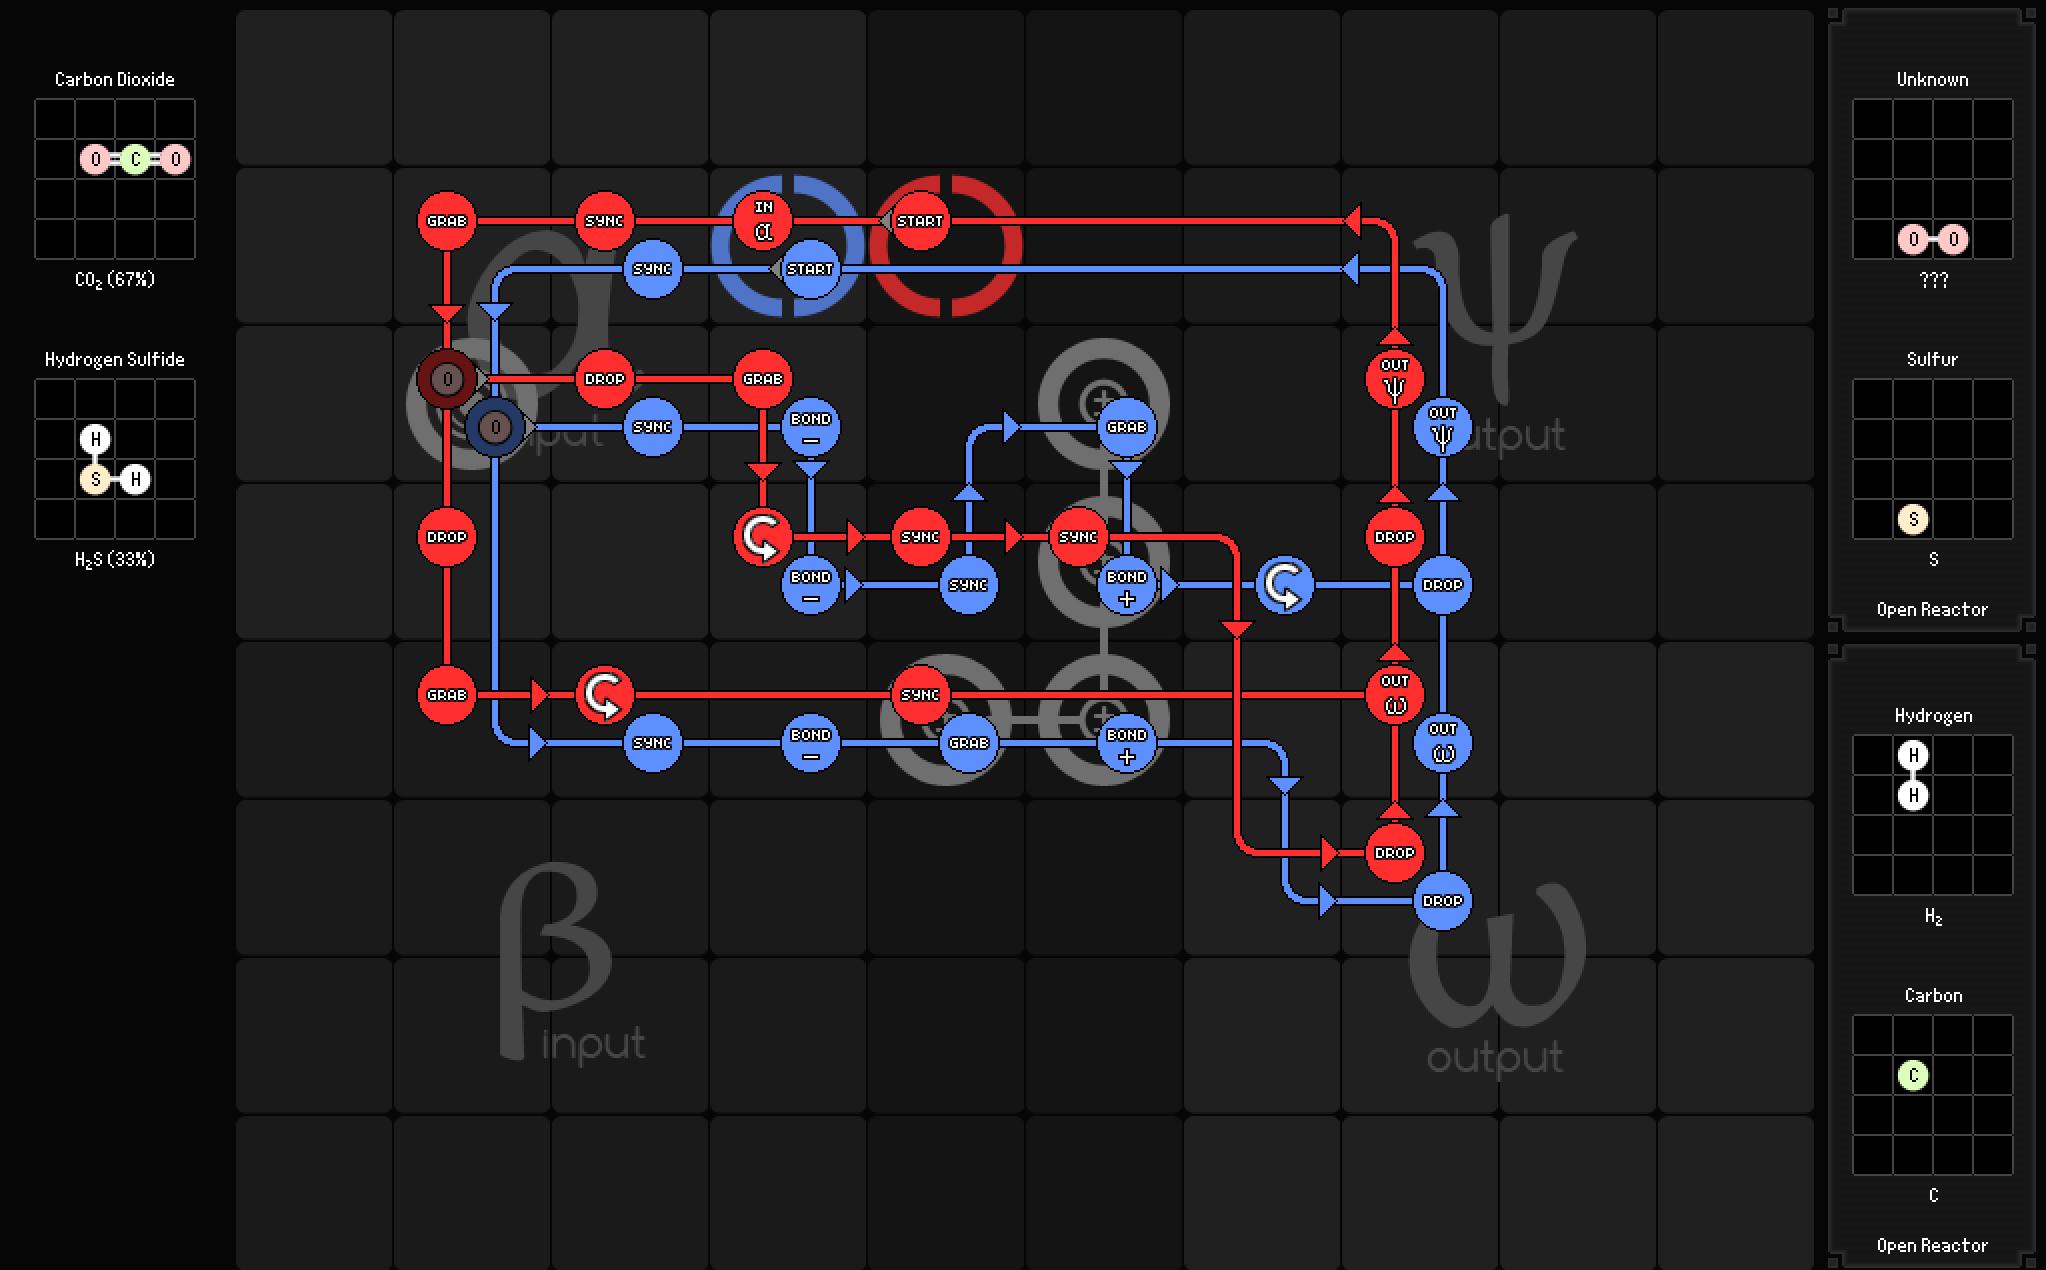 1_Story_Mode/4_Alkonost/SpaceChem-4.6.a/Reactor_1.png